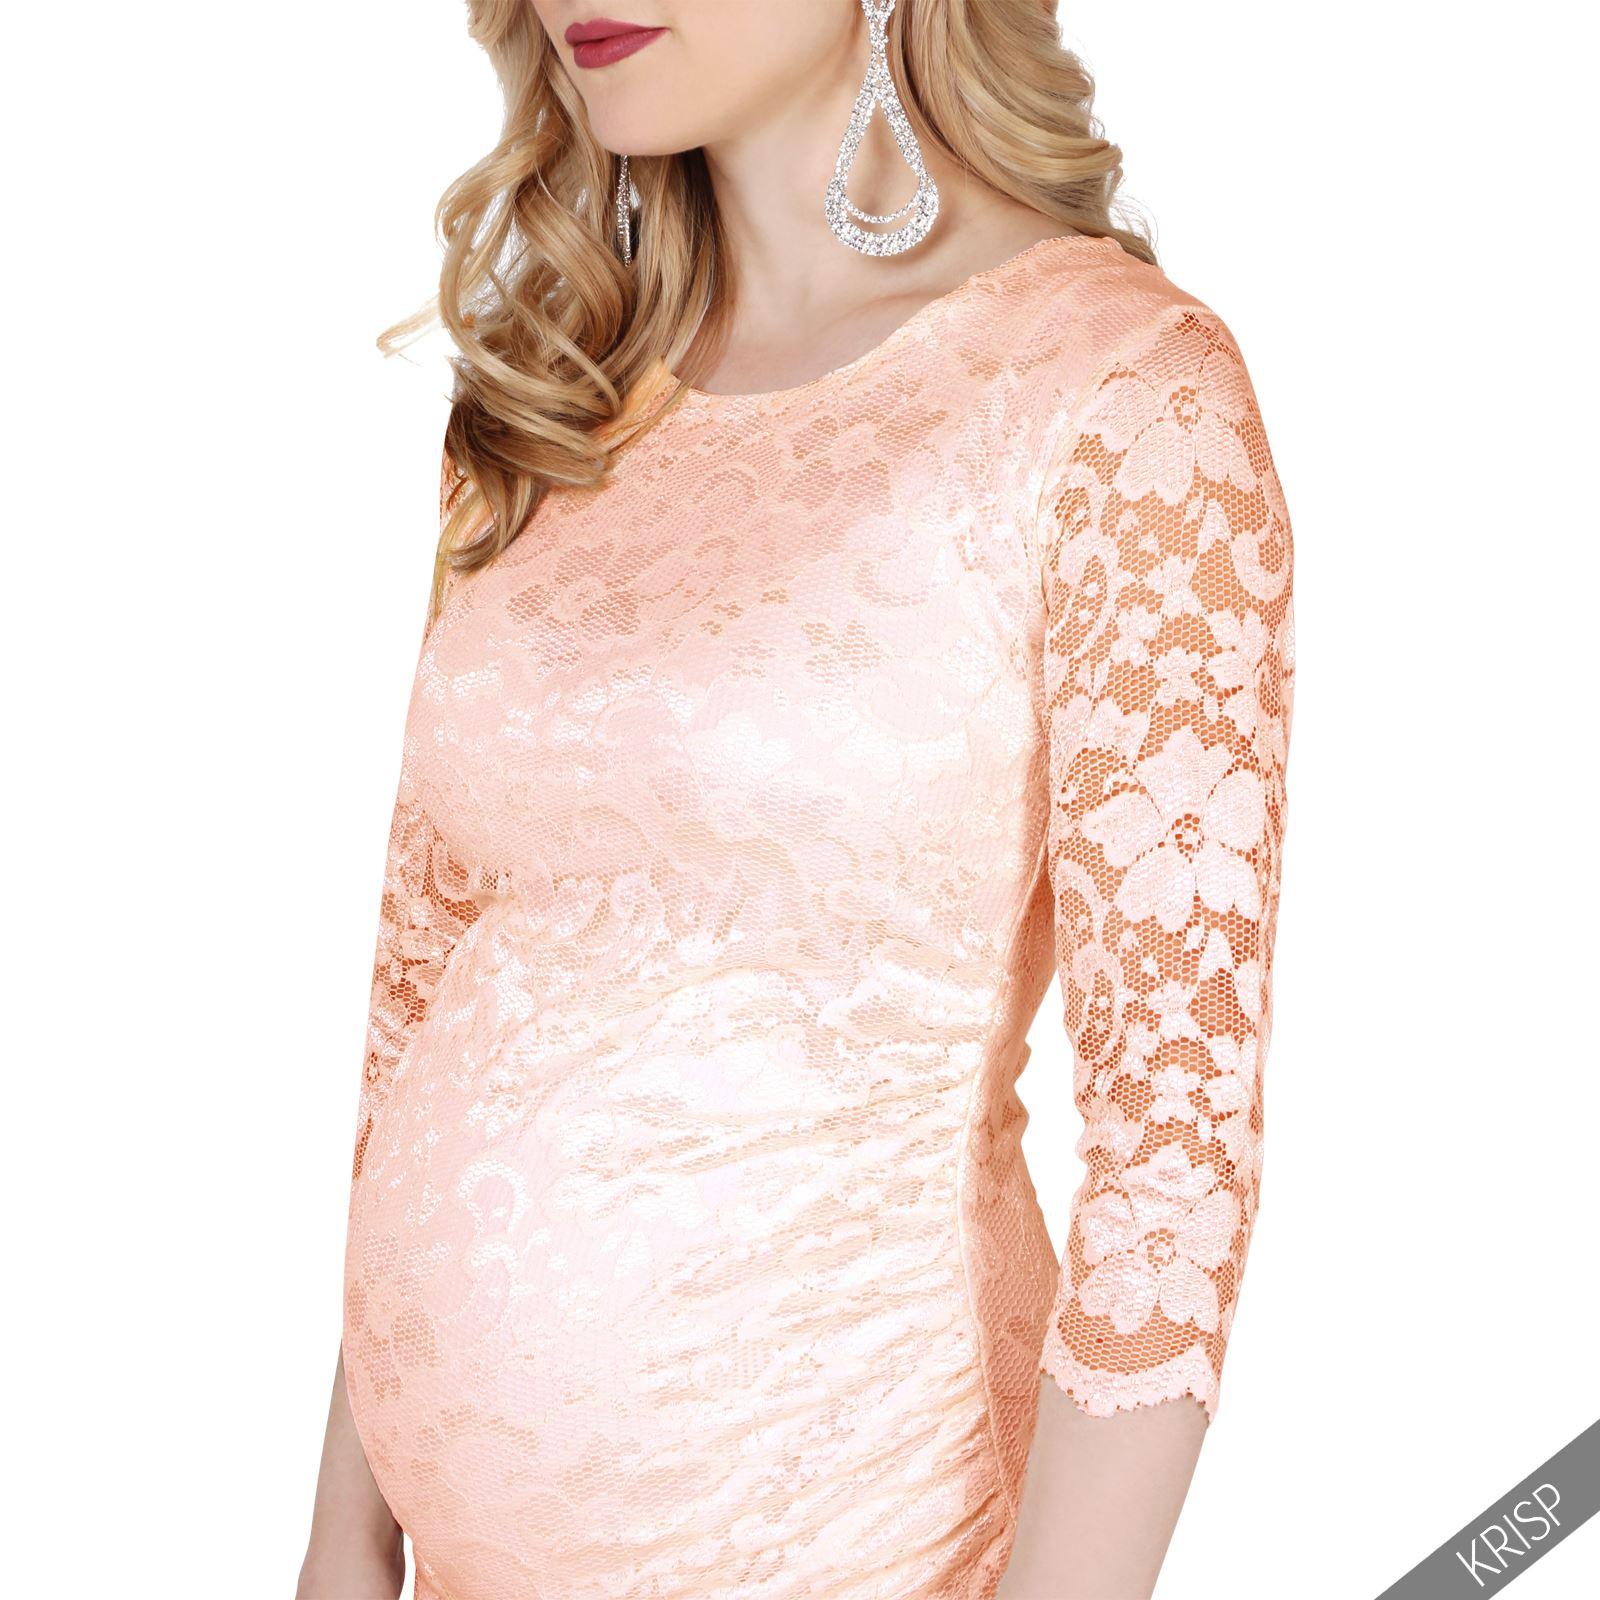 Femmes-Robe-Crayon-Midi-Dentelle-Crochet-Fleurs-Floral-Maternite-Mamans-Cocktail